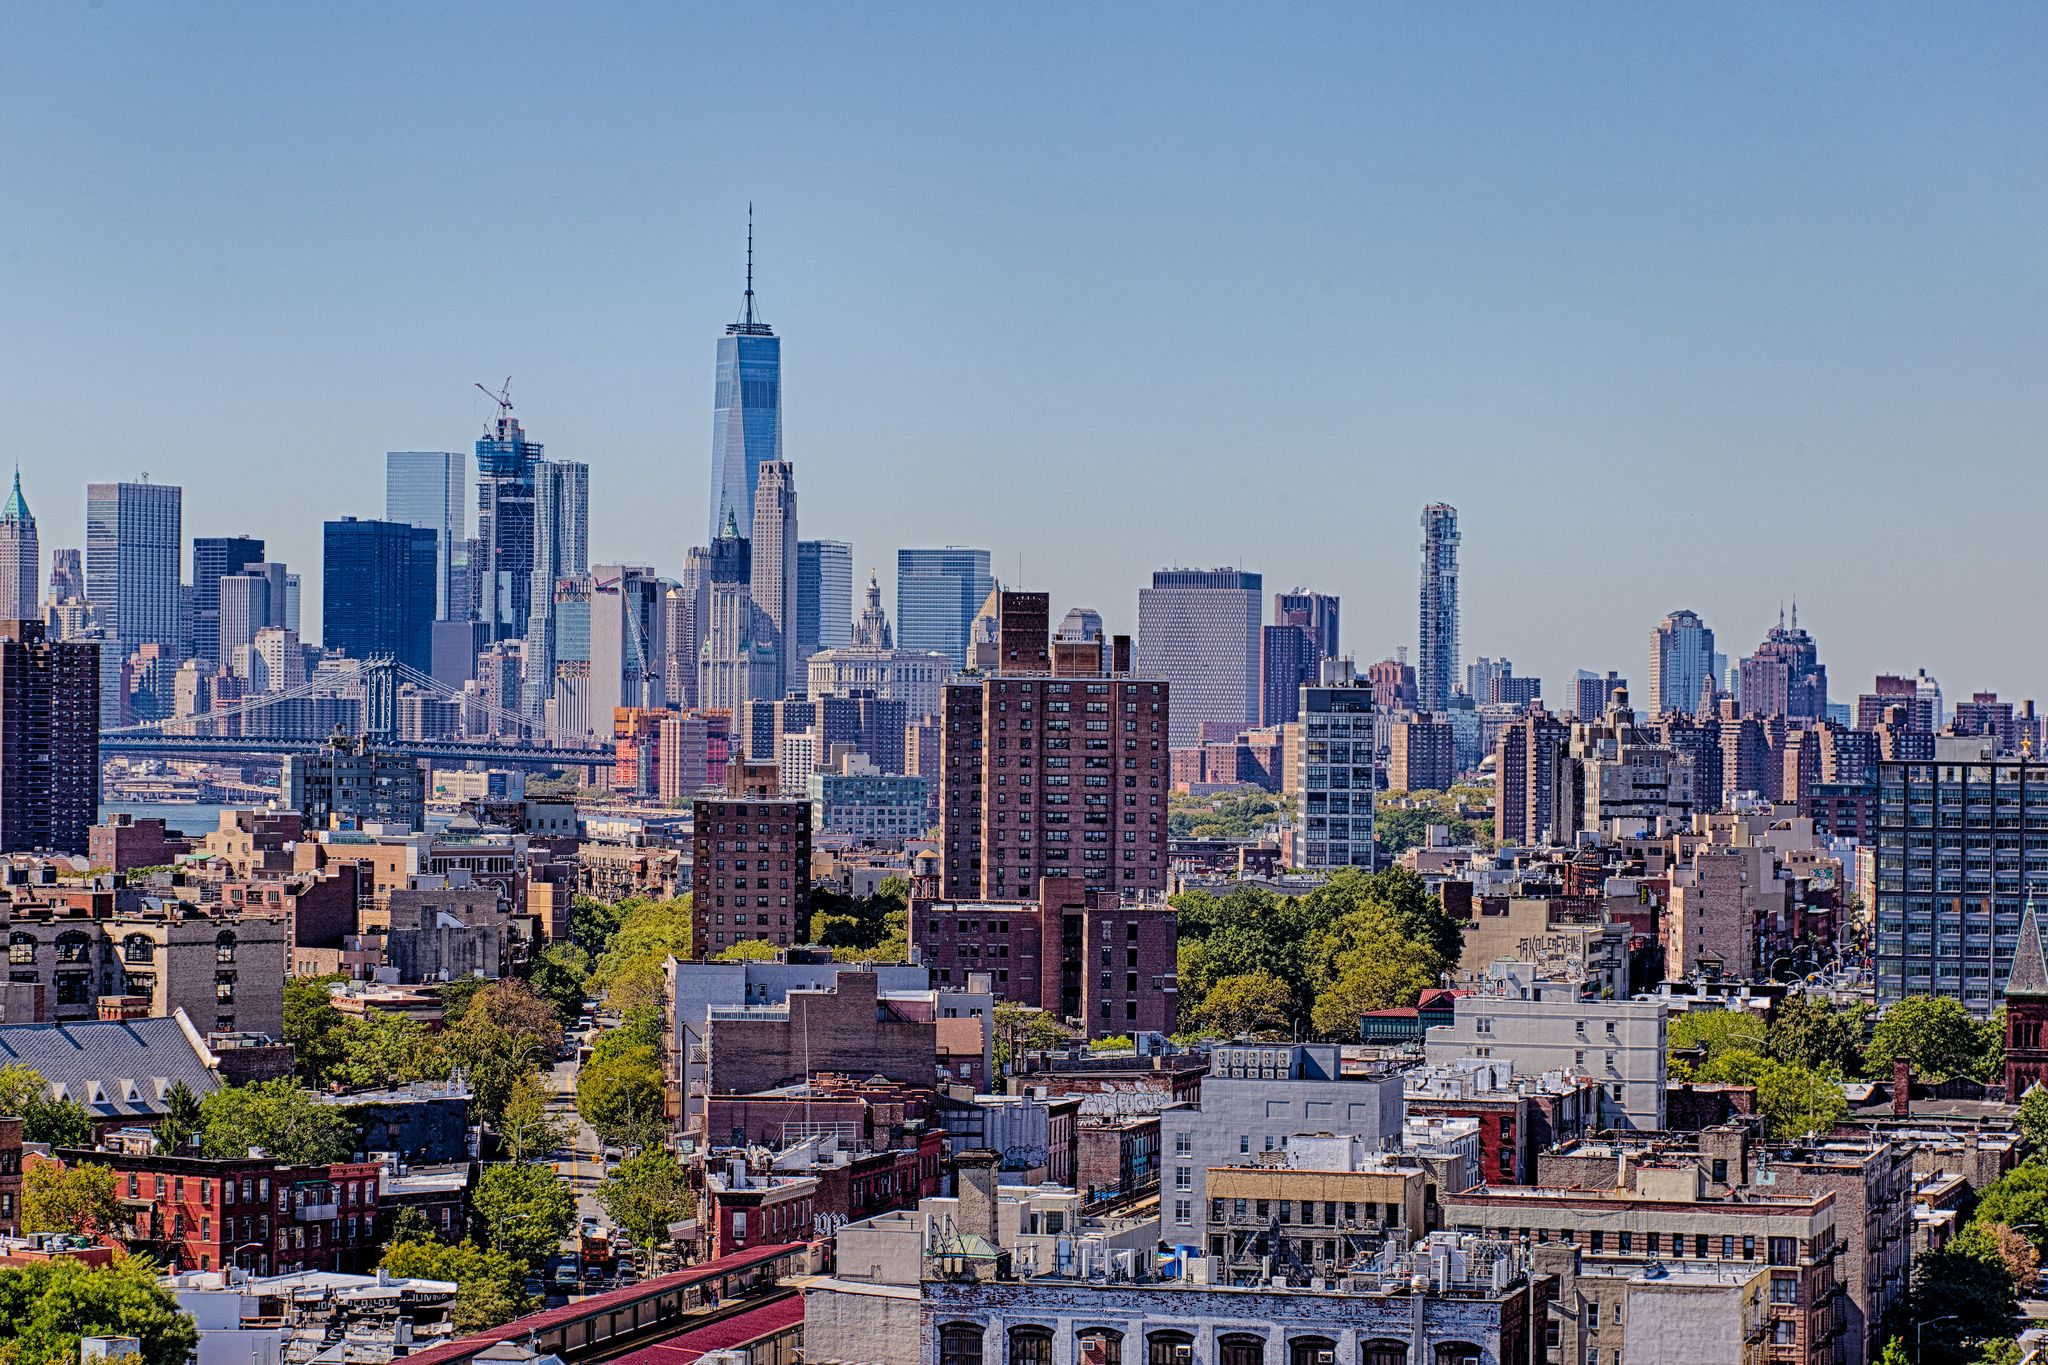 New York City [2048 x 1365]